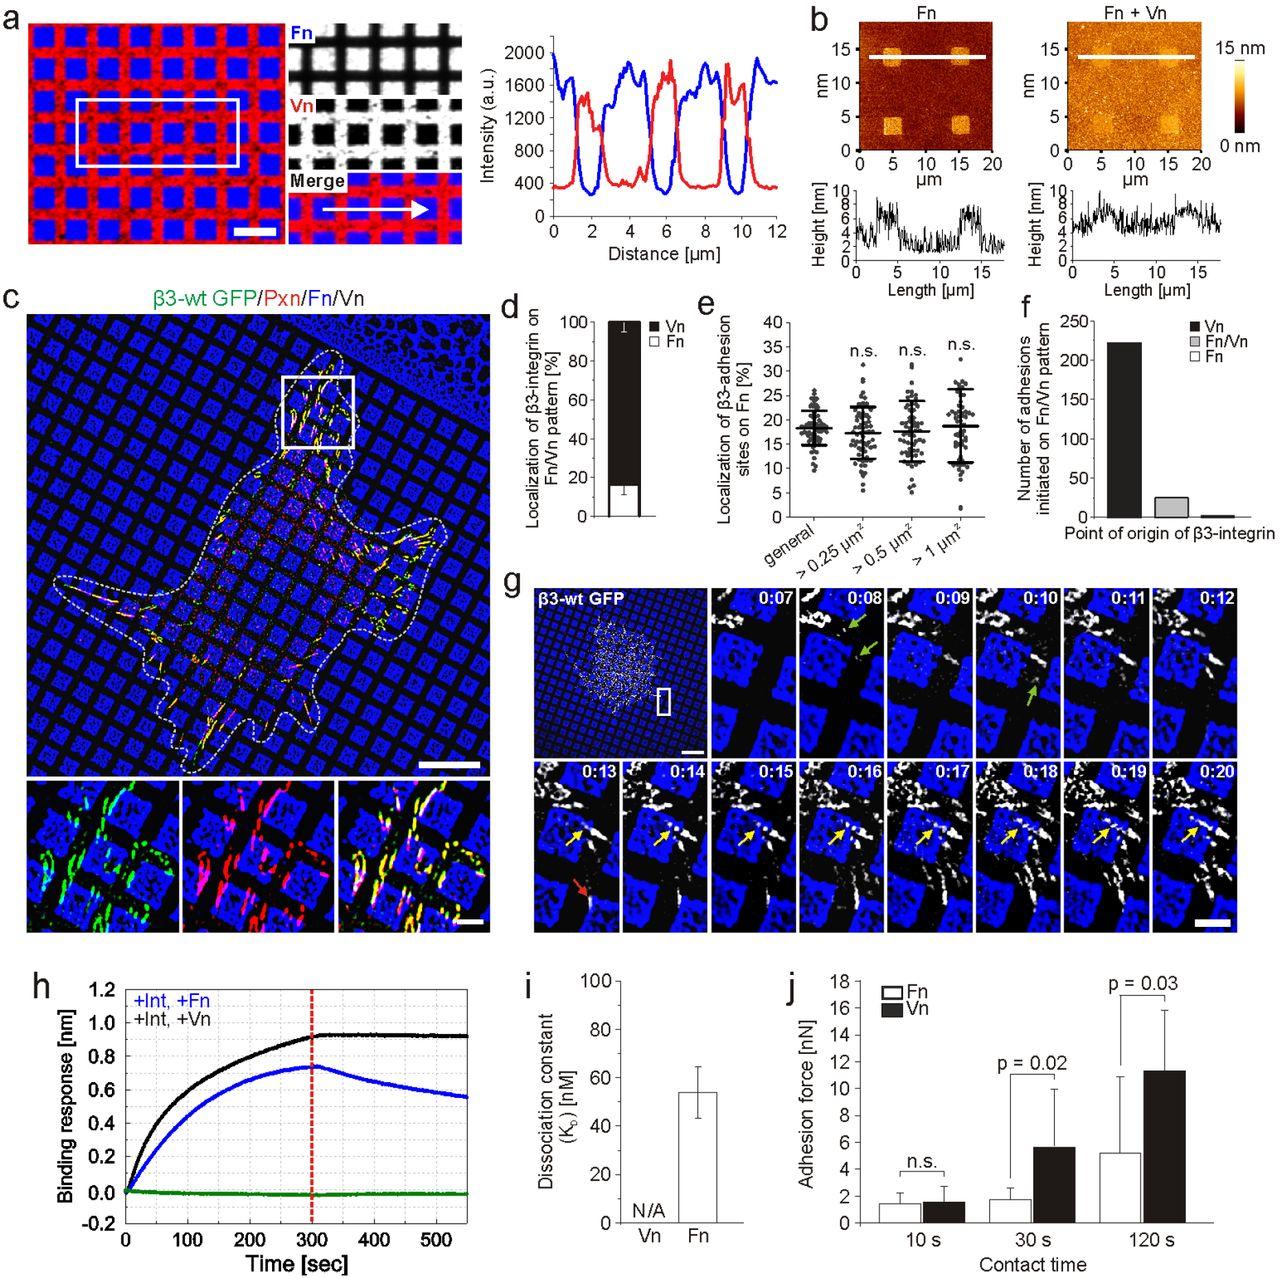 Force-dependent ligand sensing enables αVβ3 integrin to